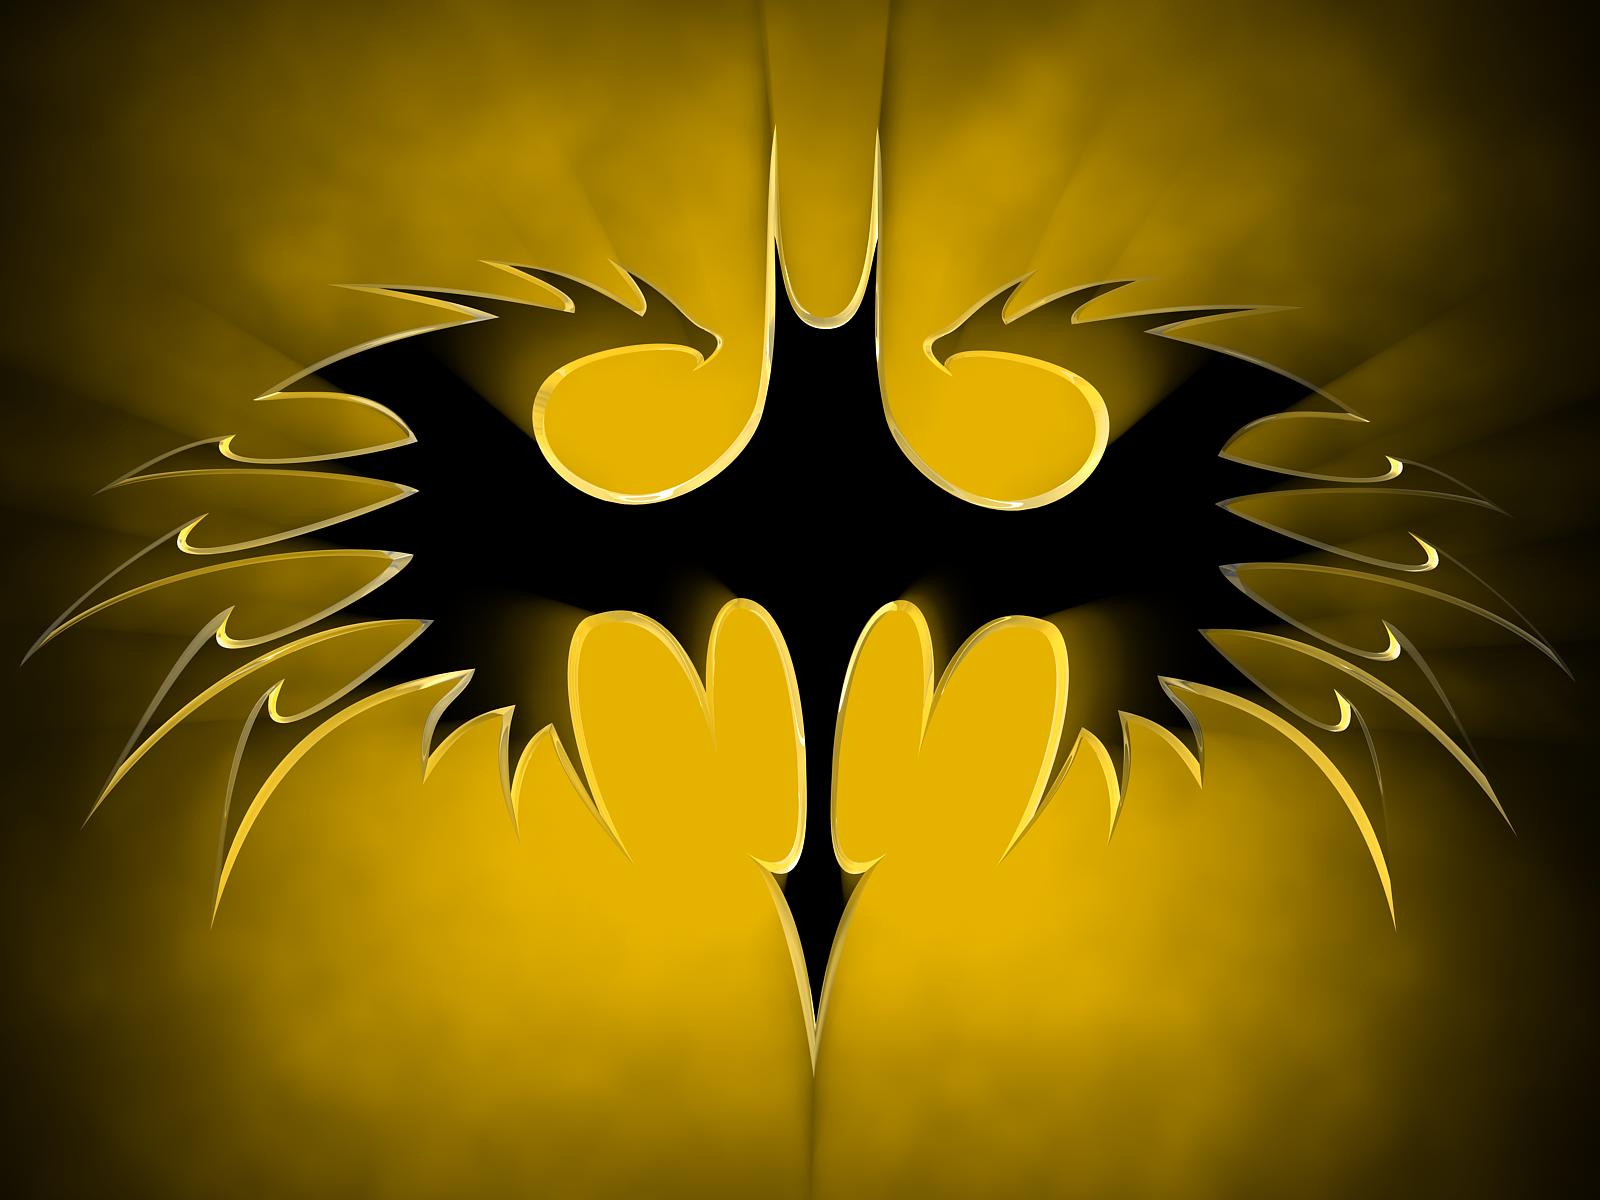 Batman For Downloads [100 Virus] Batman Wallpapers 1600x1200